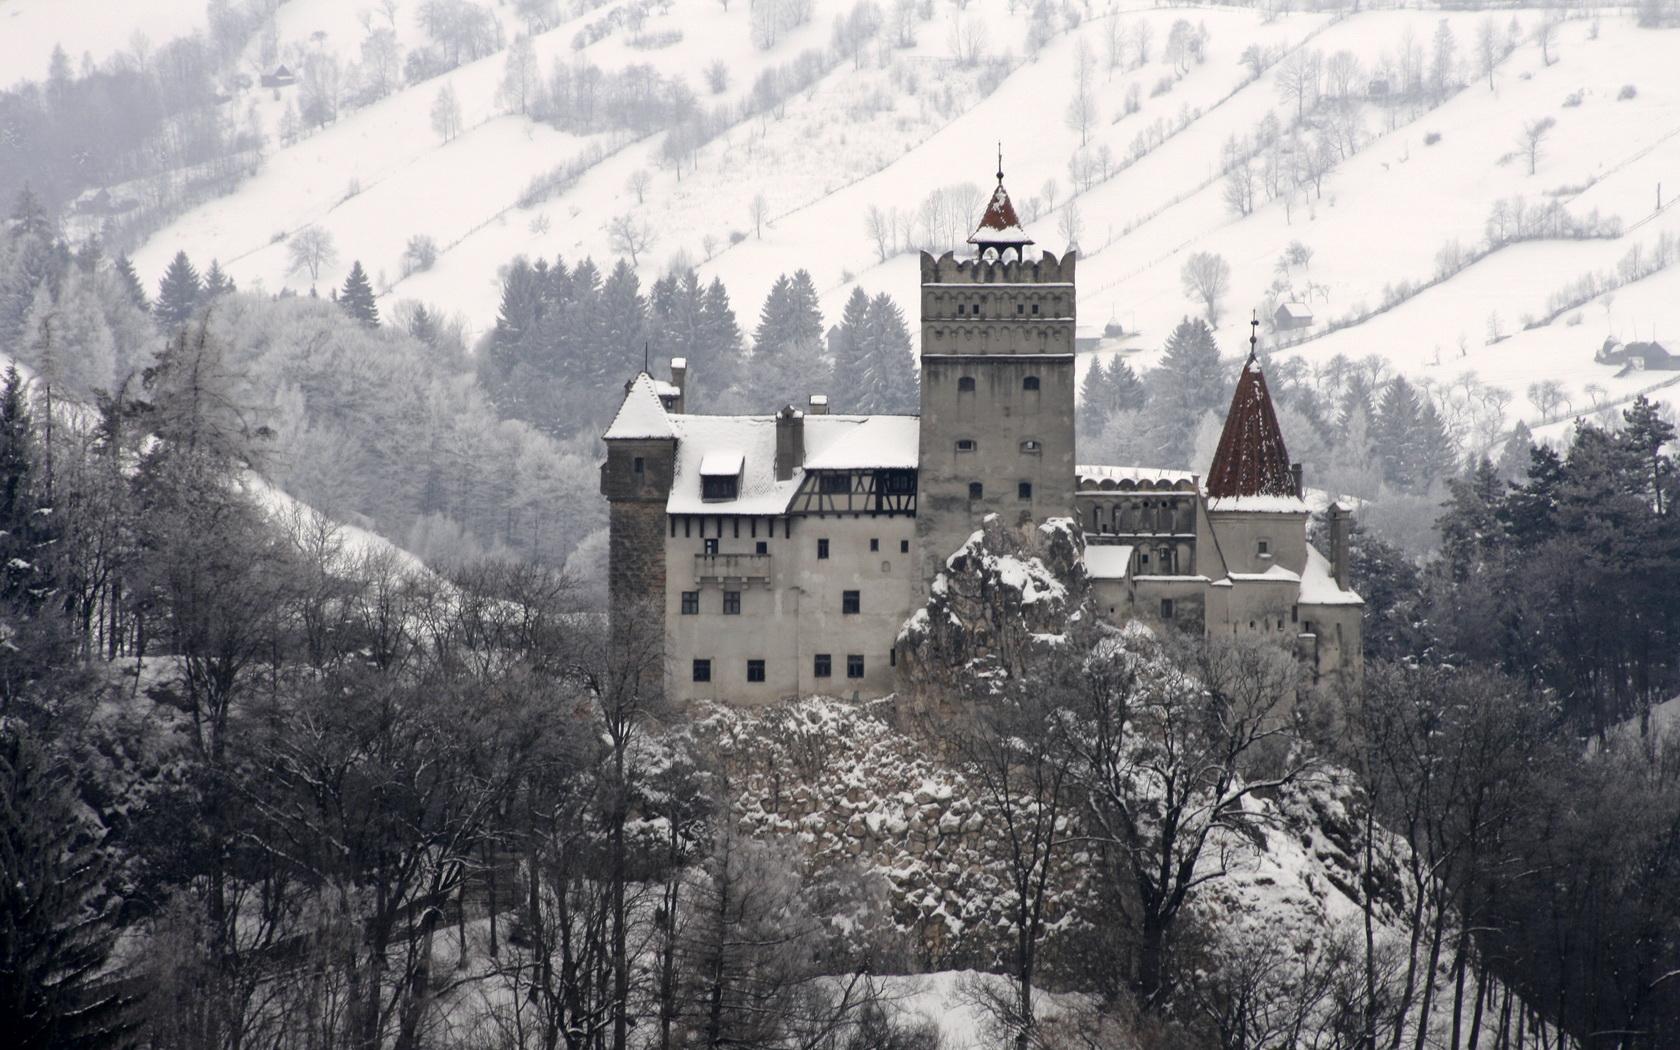 Draculas Castle Bran Transylvania Romania wallpaper background 1680x1050